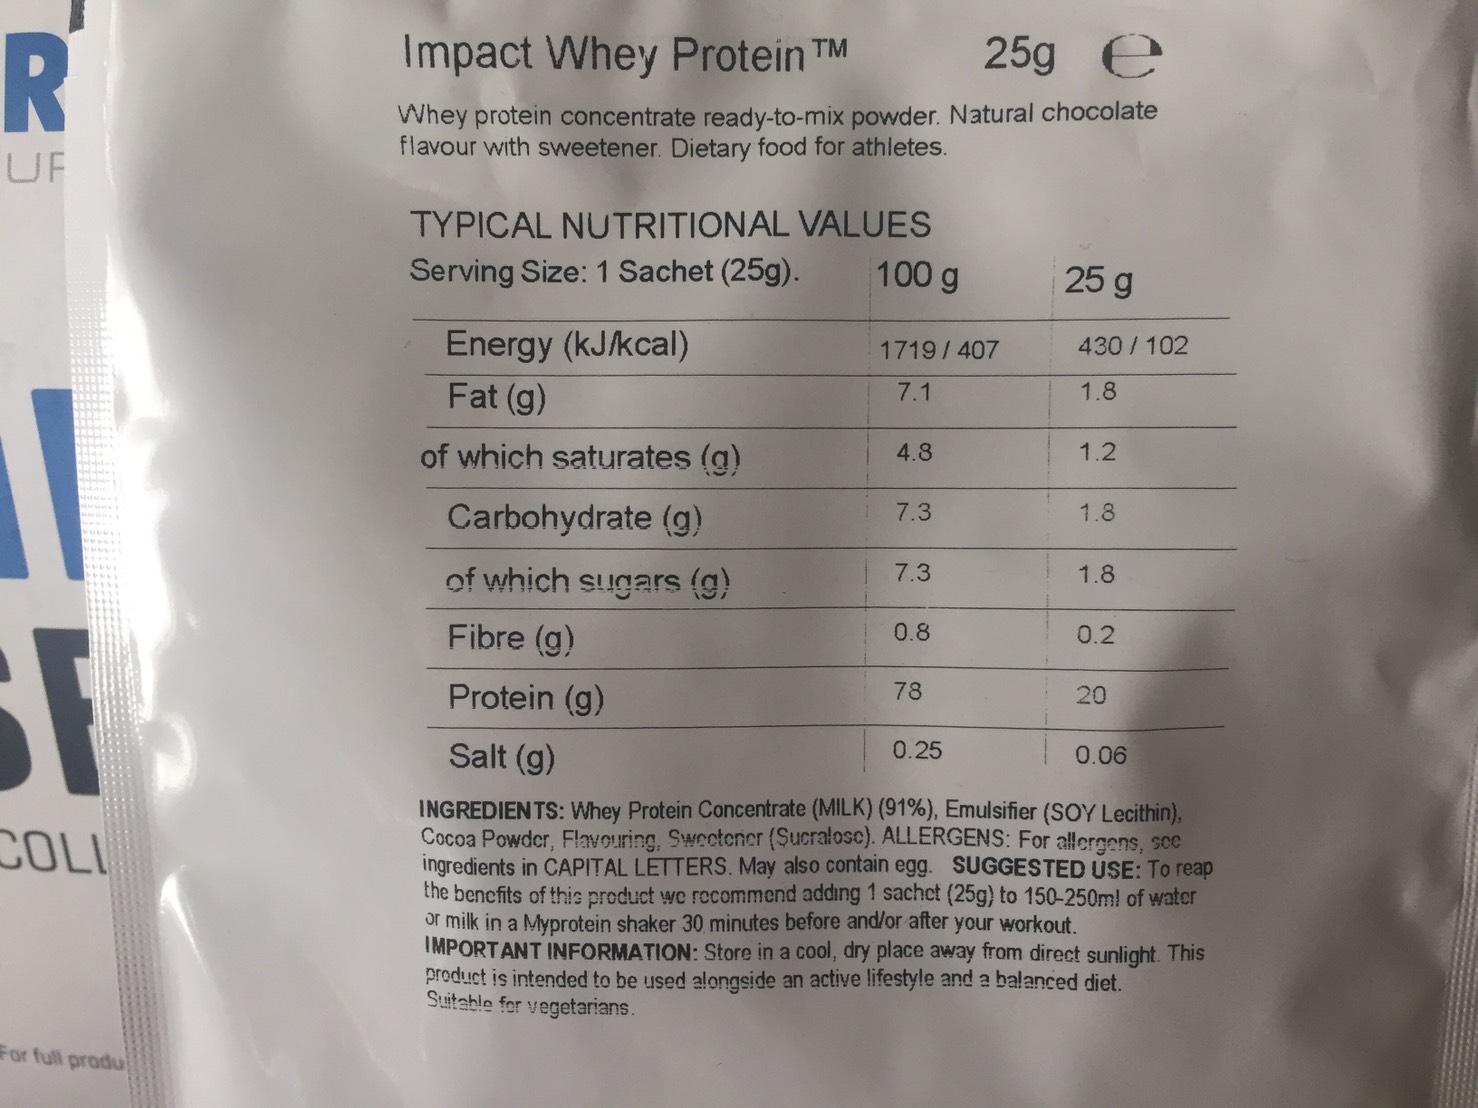 【WPC】Impactホエイプロテイン「Natural Chocolate(ナチュラルチョコレート味)」の成分表